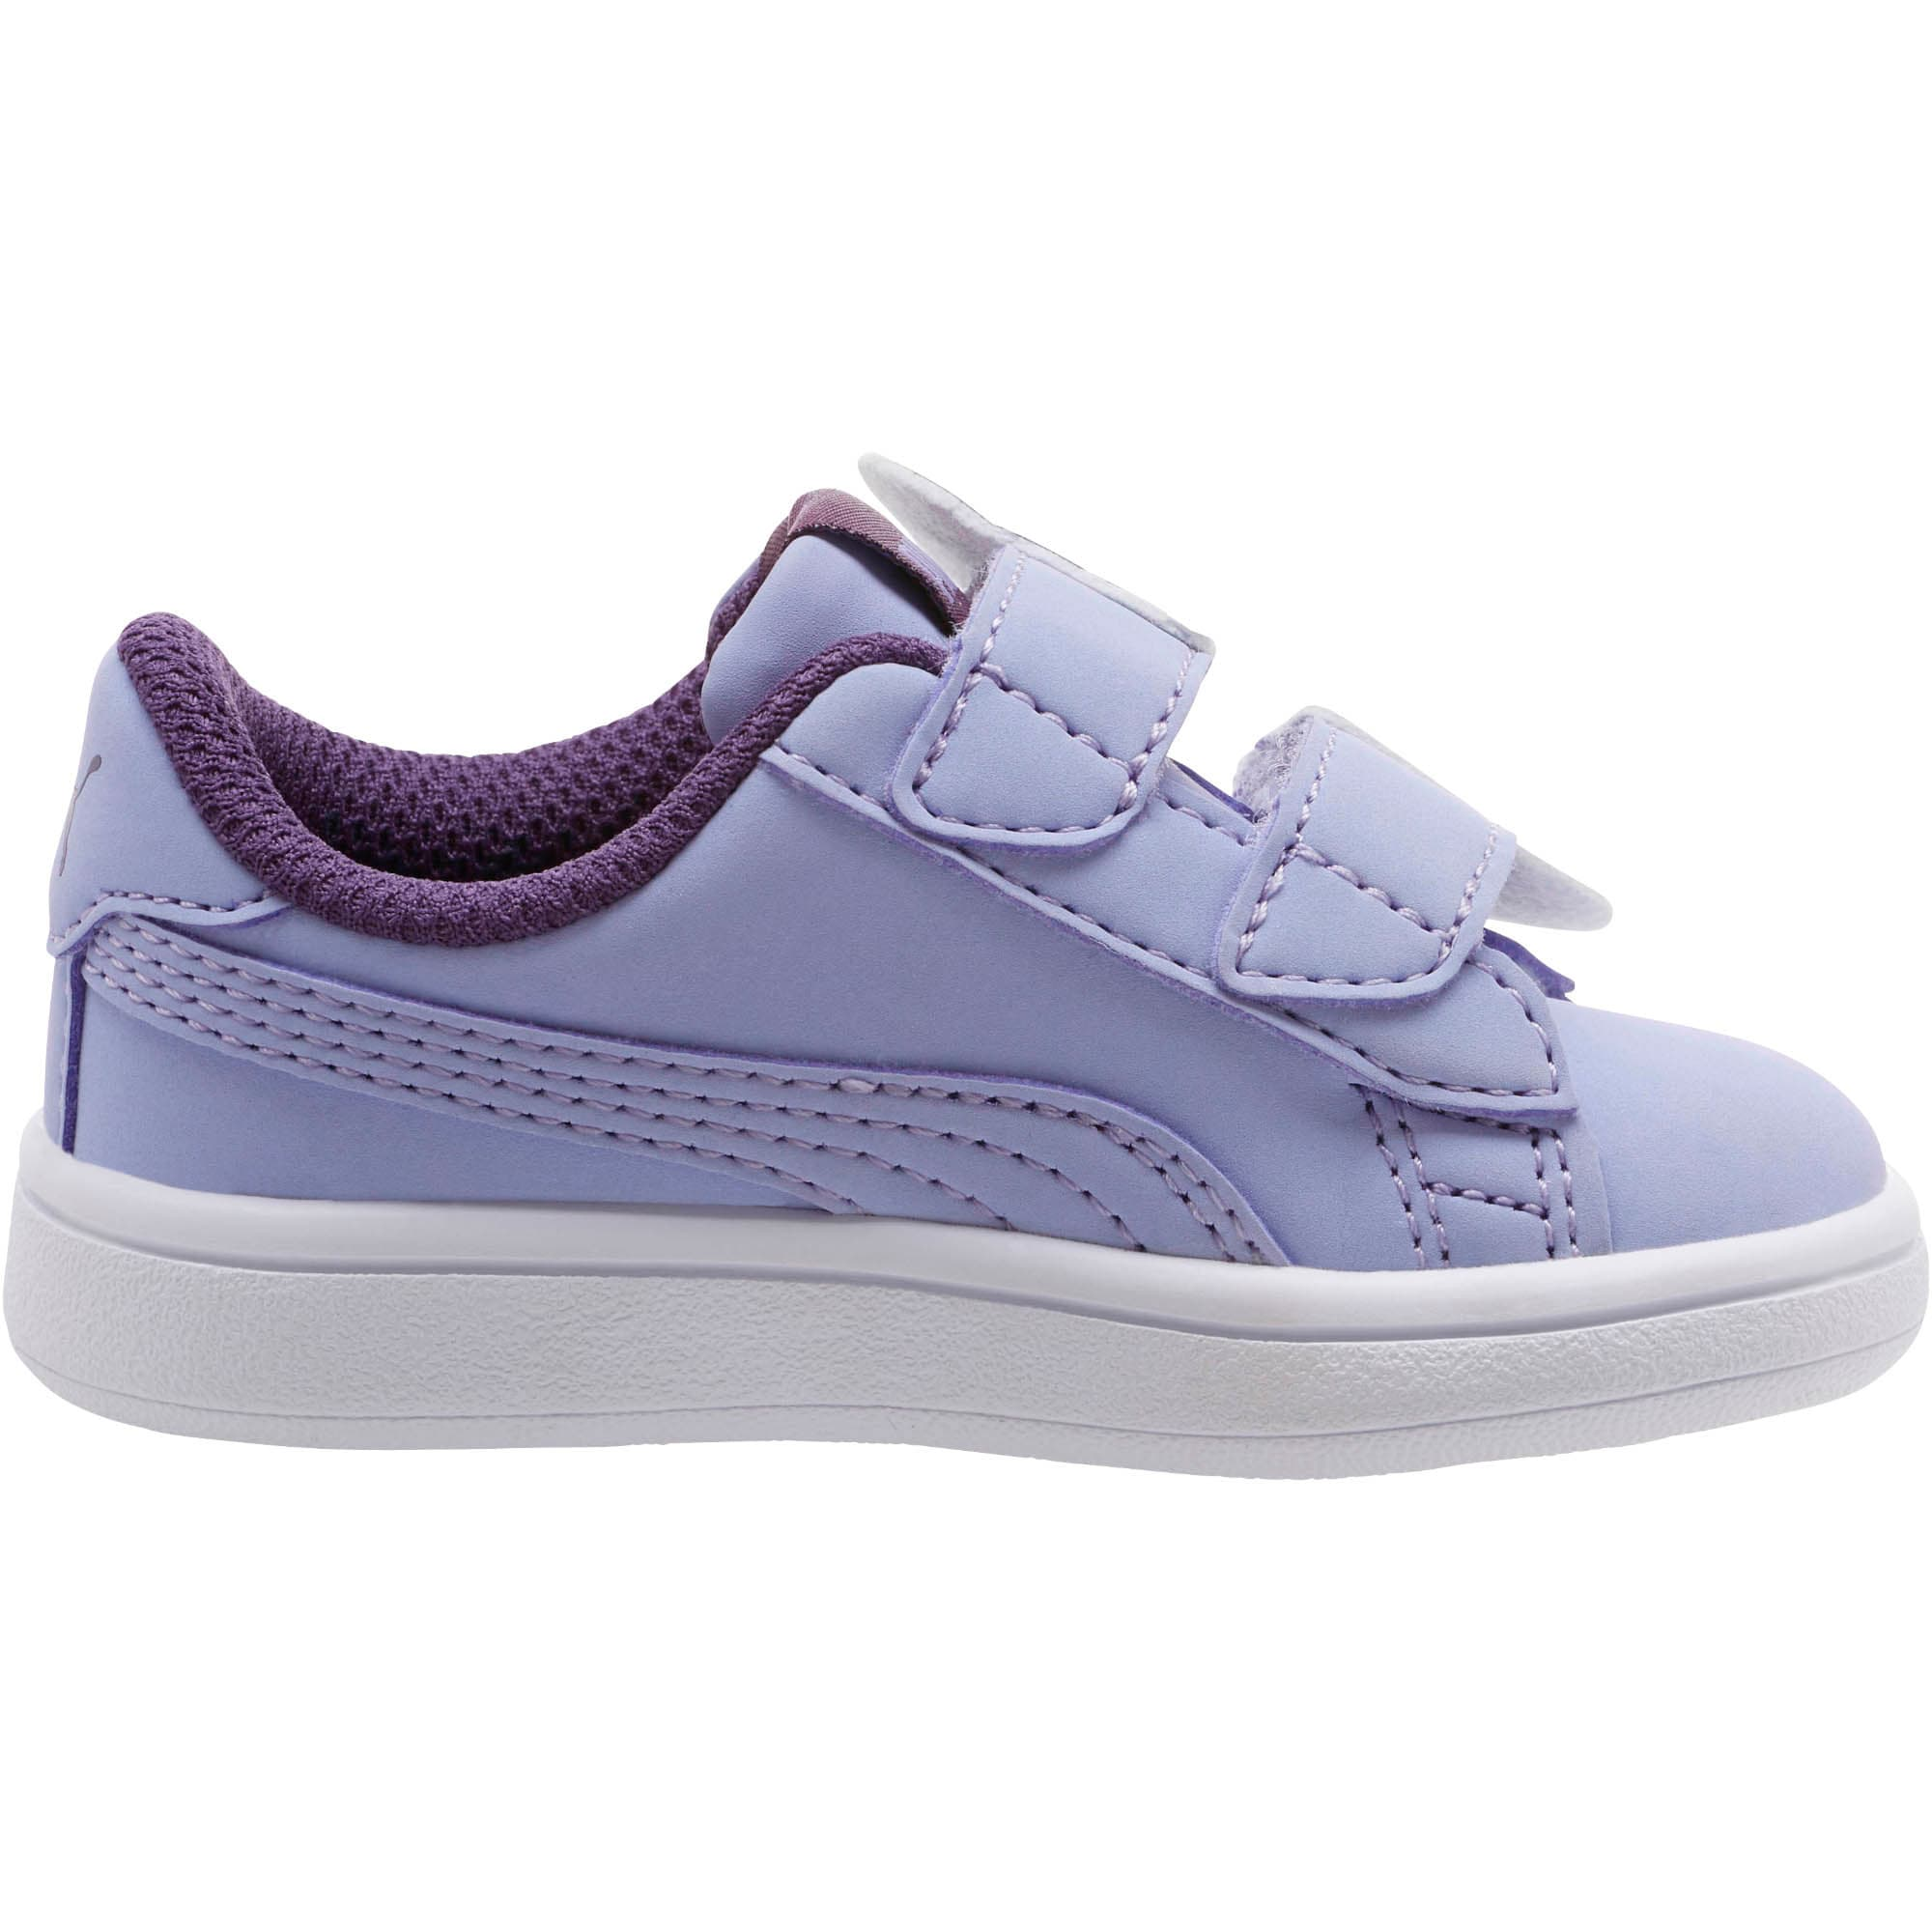 Thumbnail 4 of PUMA Smash v2 Butterfly AC Toddler Shoes, Sweet Lavender-Indigo-White, medium